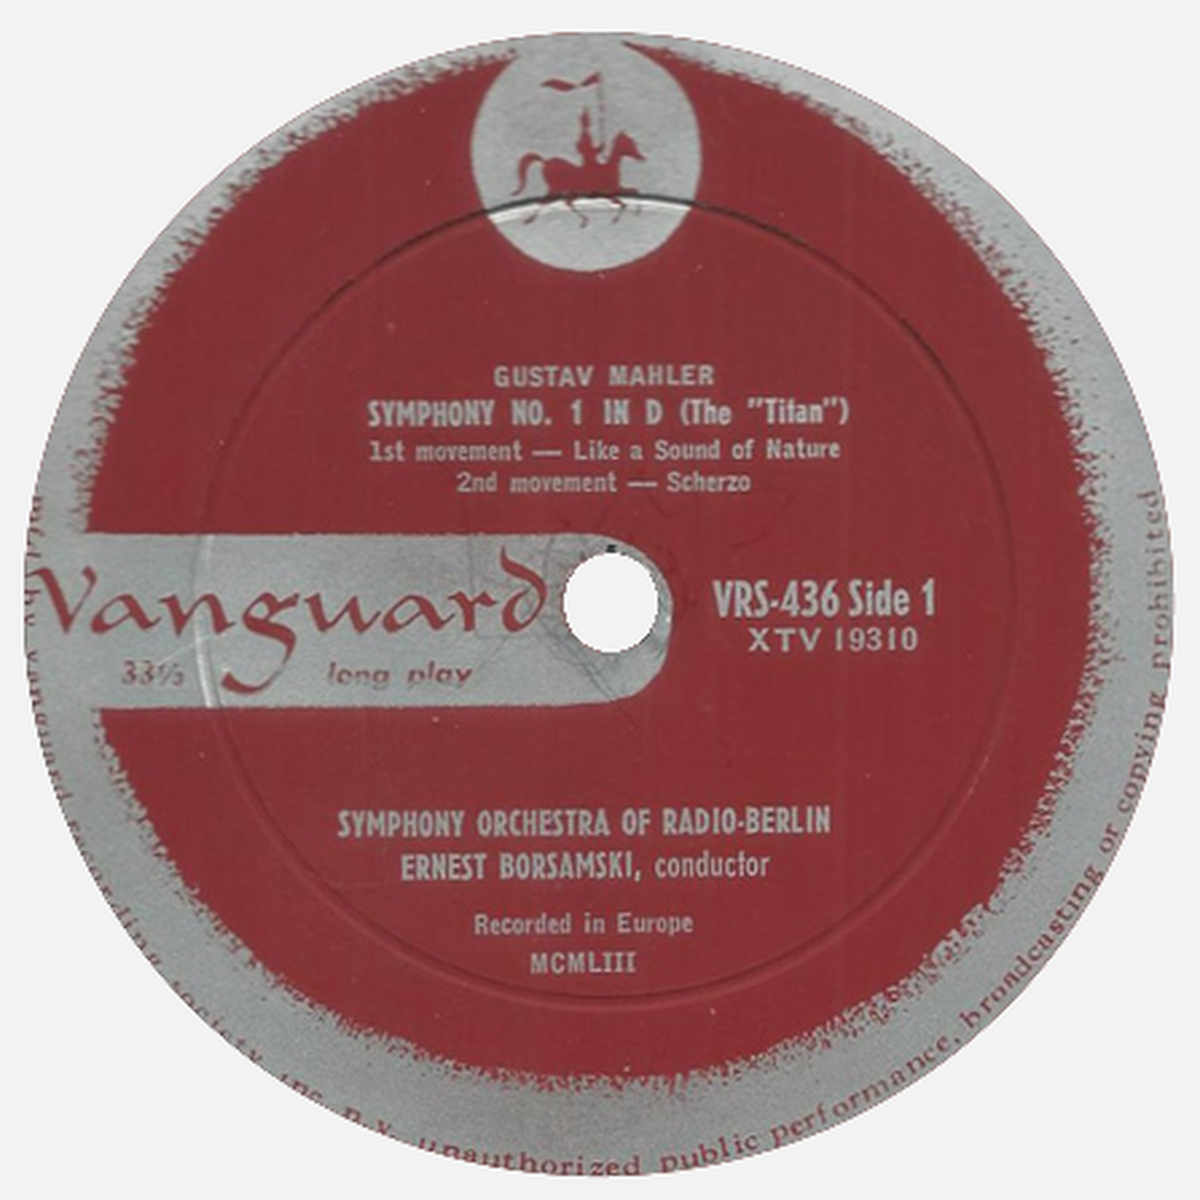 Vanguard VRS 436